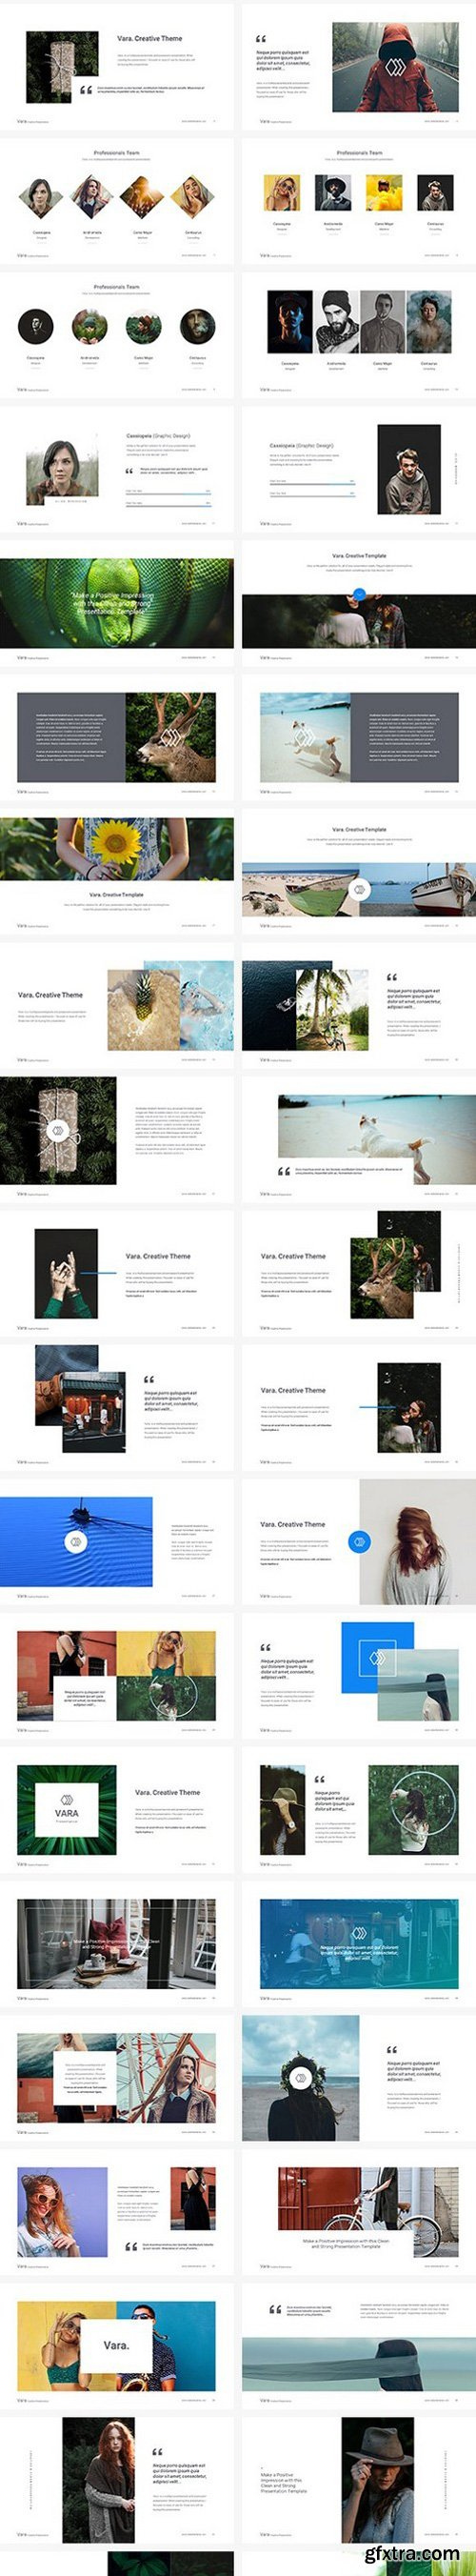 Vara - Creative PowerPoint Template